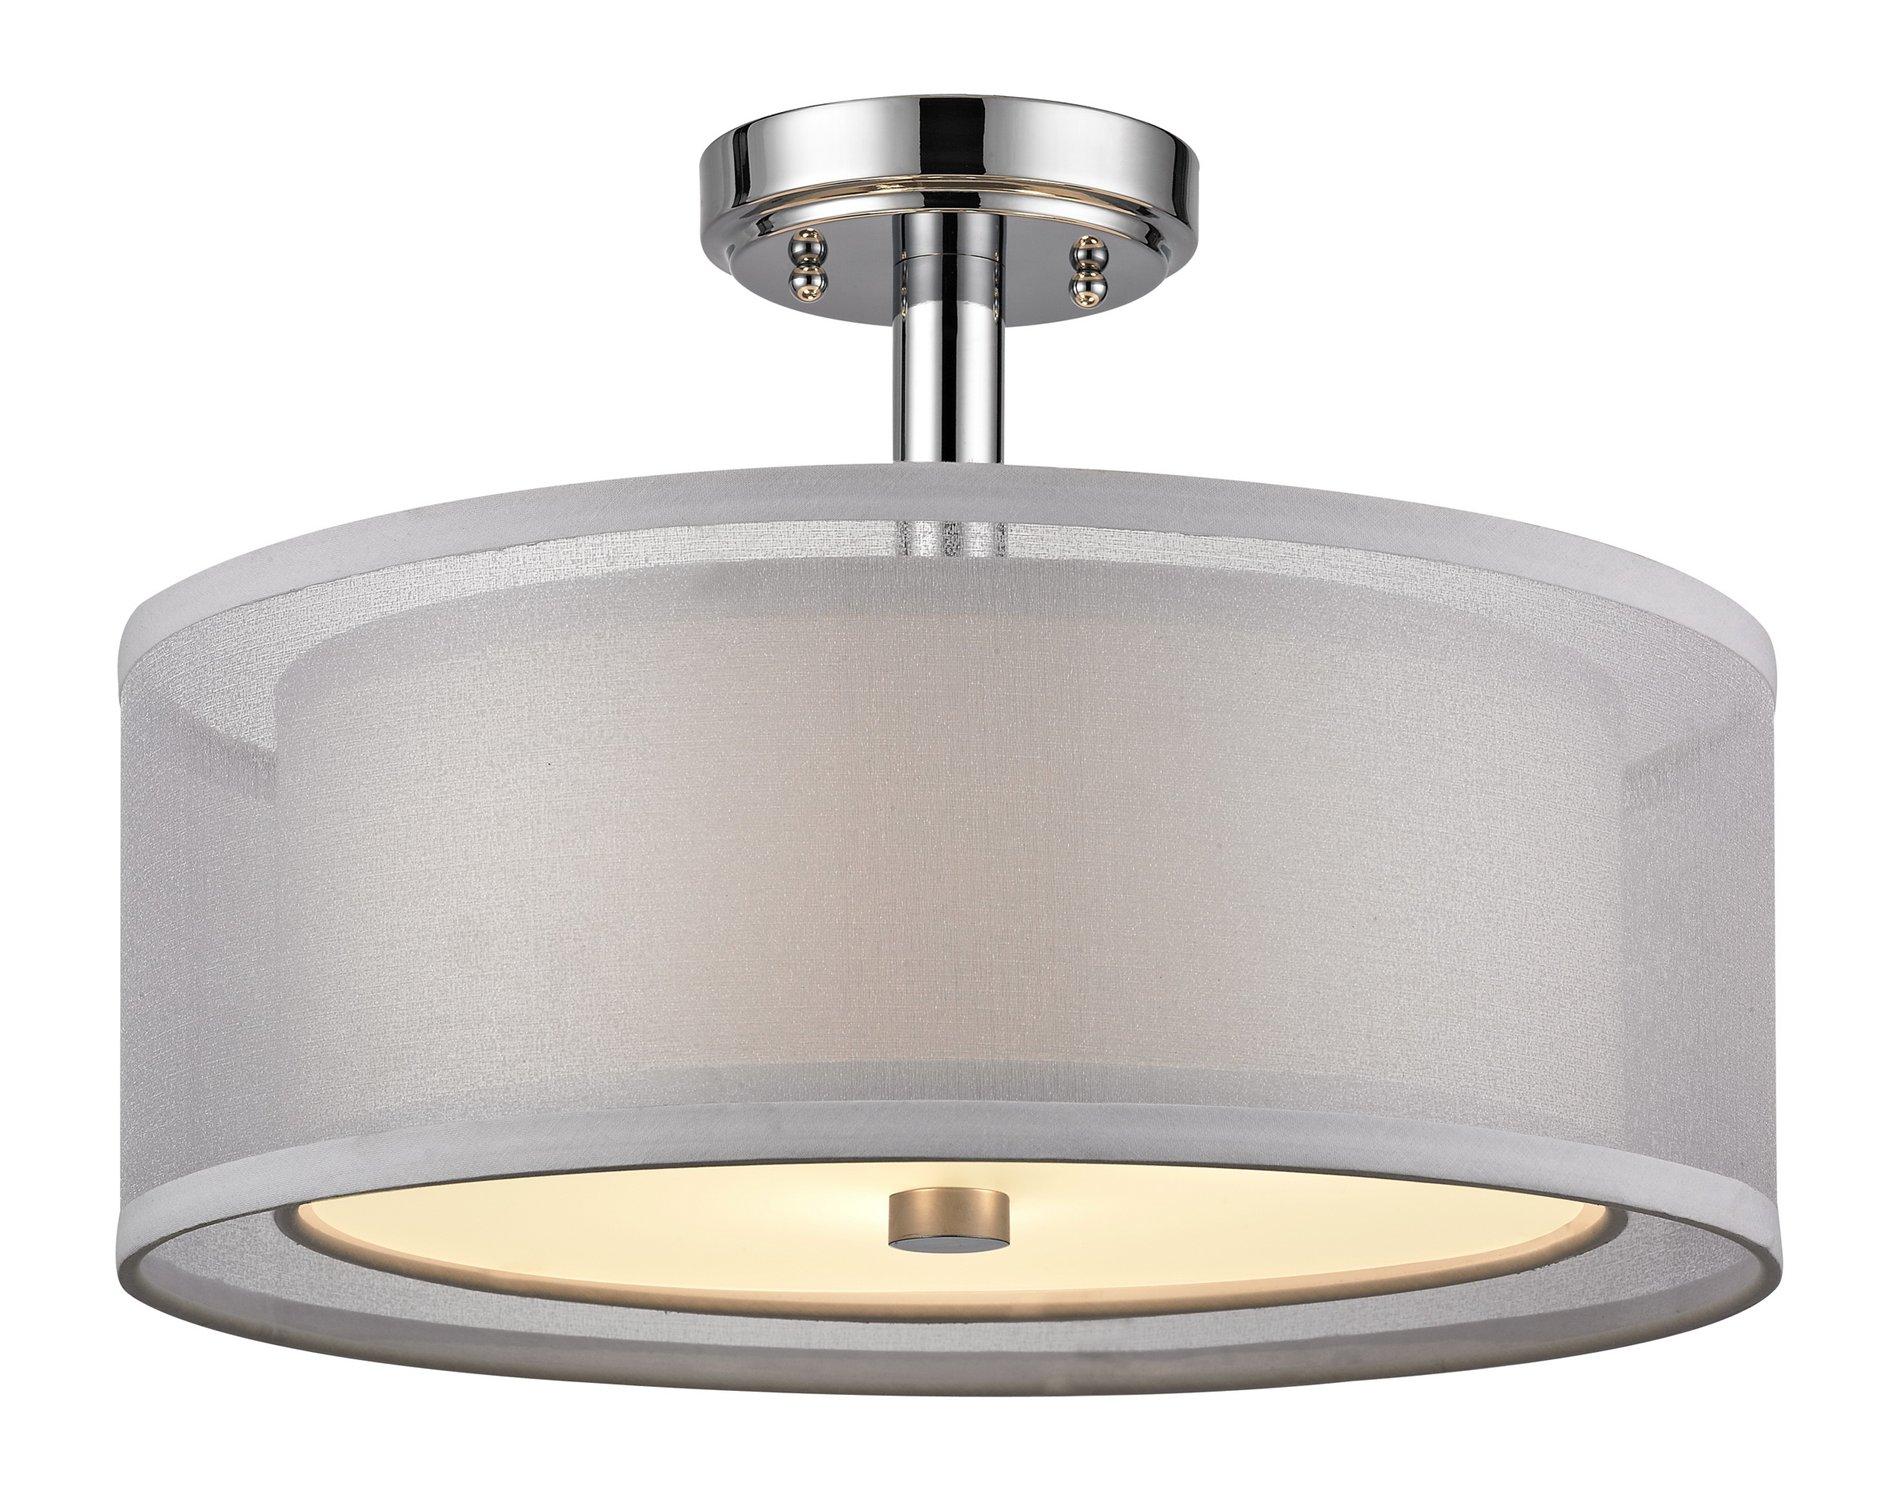 Dolan Design 1275 Double Organza Modern Contemporary Semi Flush Mount Ceili